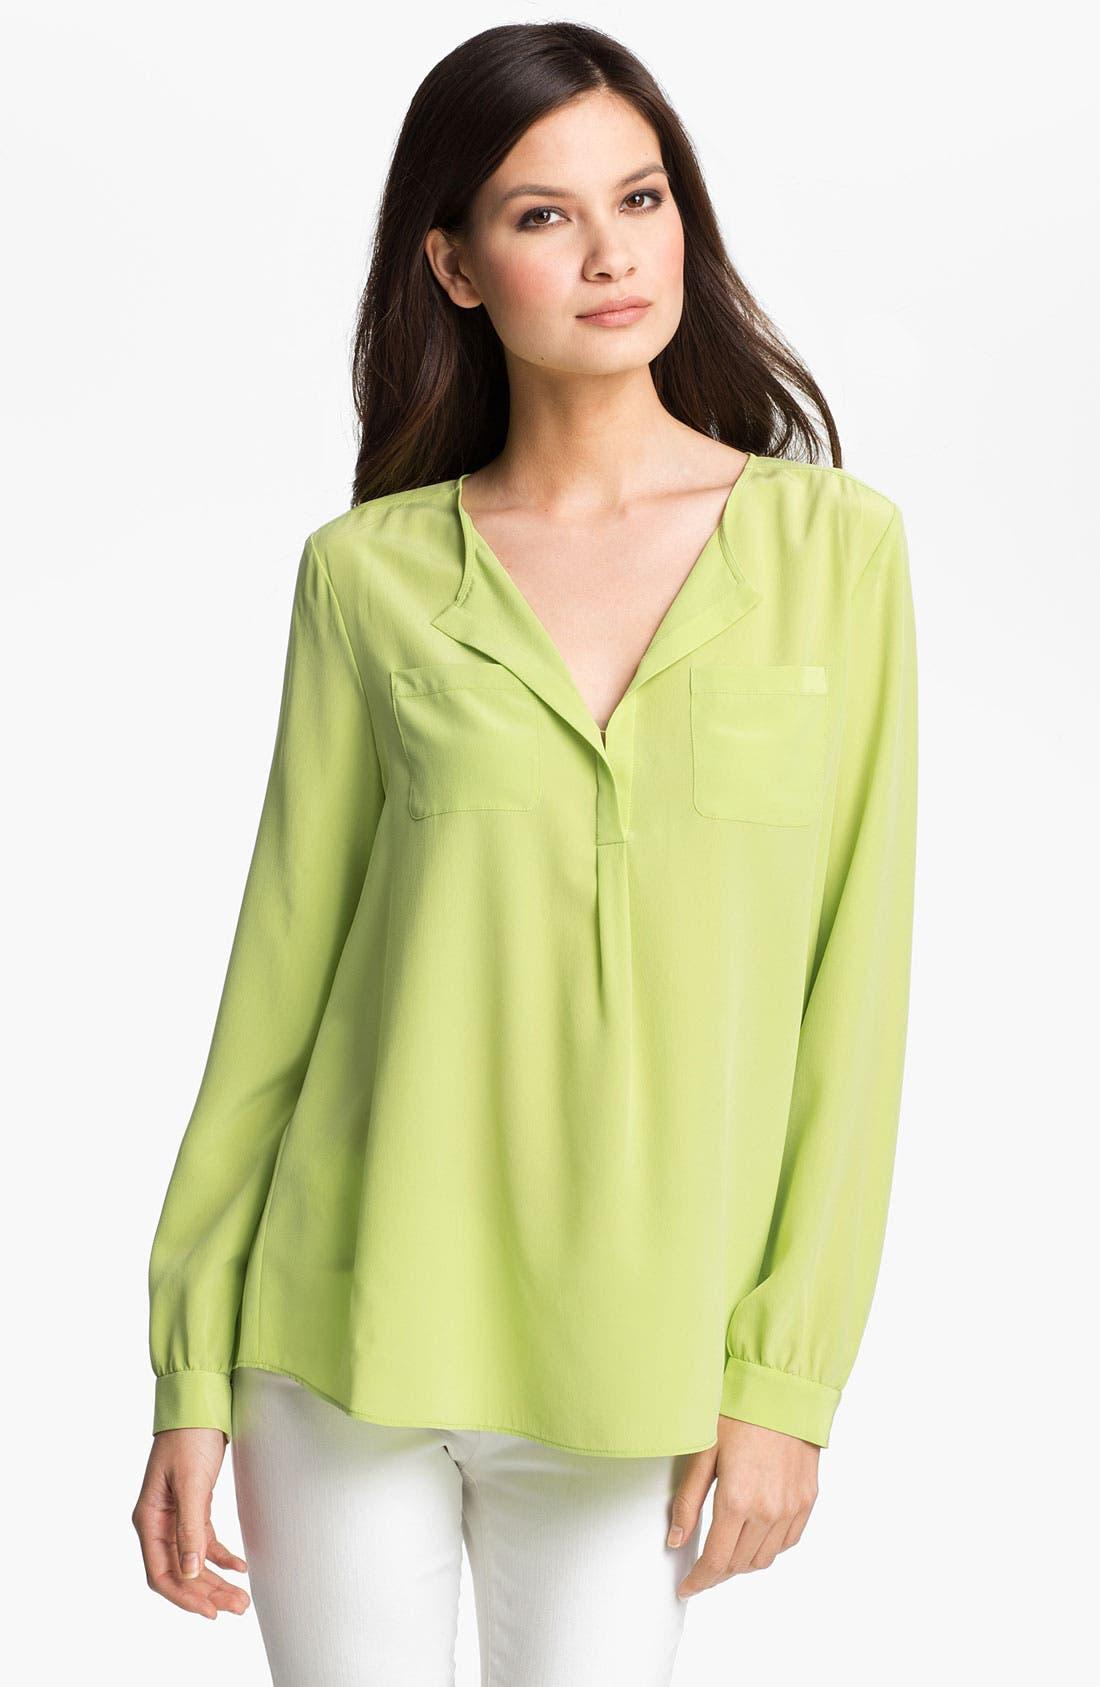 Alternate Image 1 Selected - Lafayette 148 New York 'Samantha' Sandwashed Silk Blouse